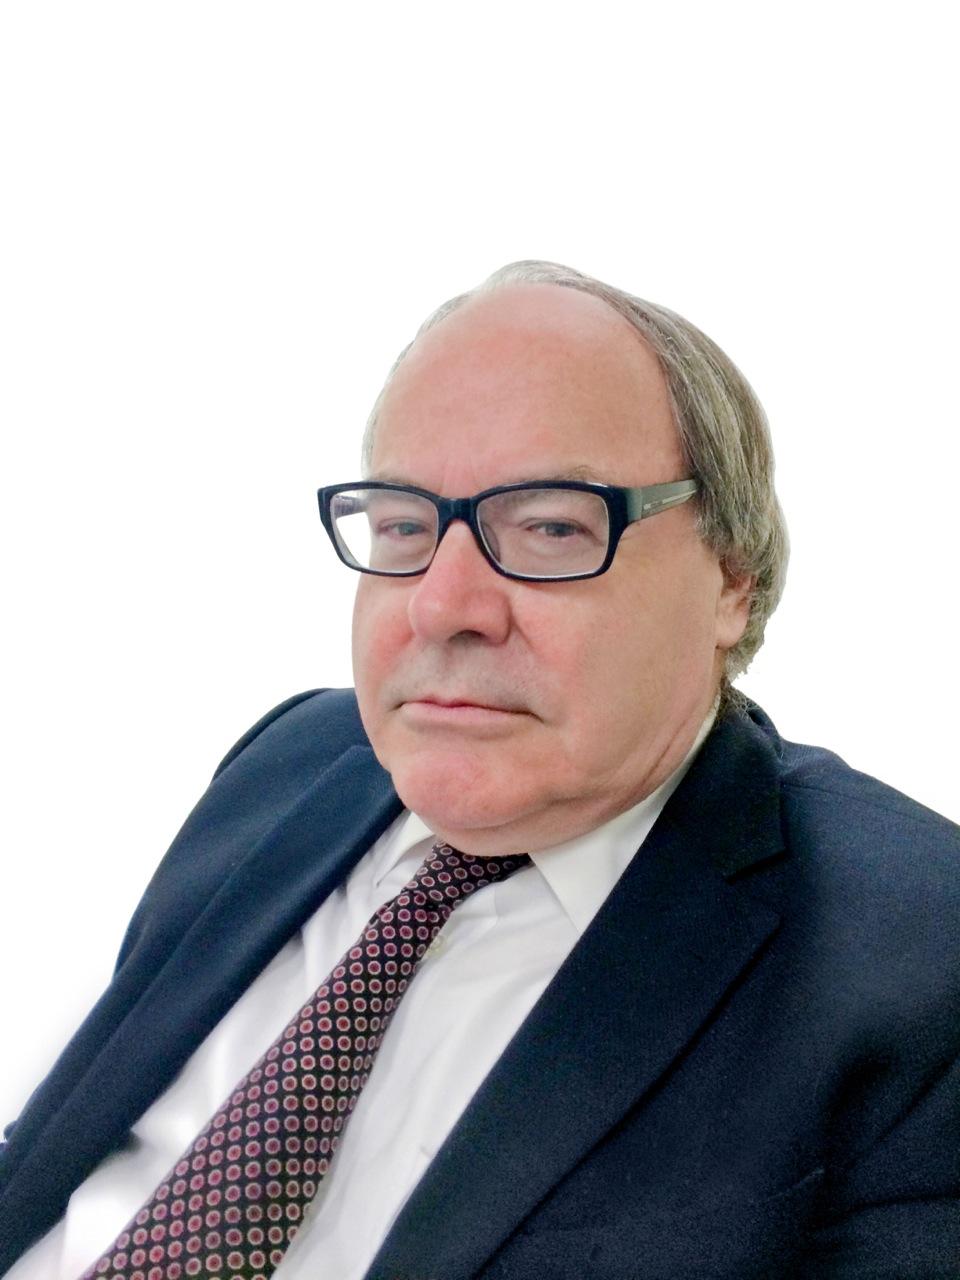 Professor Bruce Milne Hall